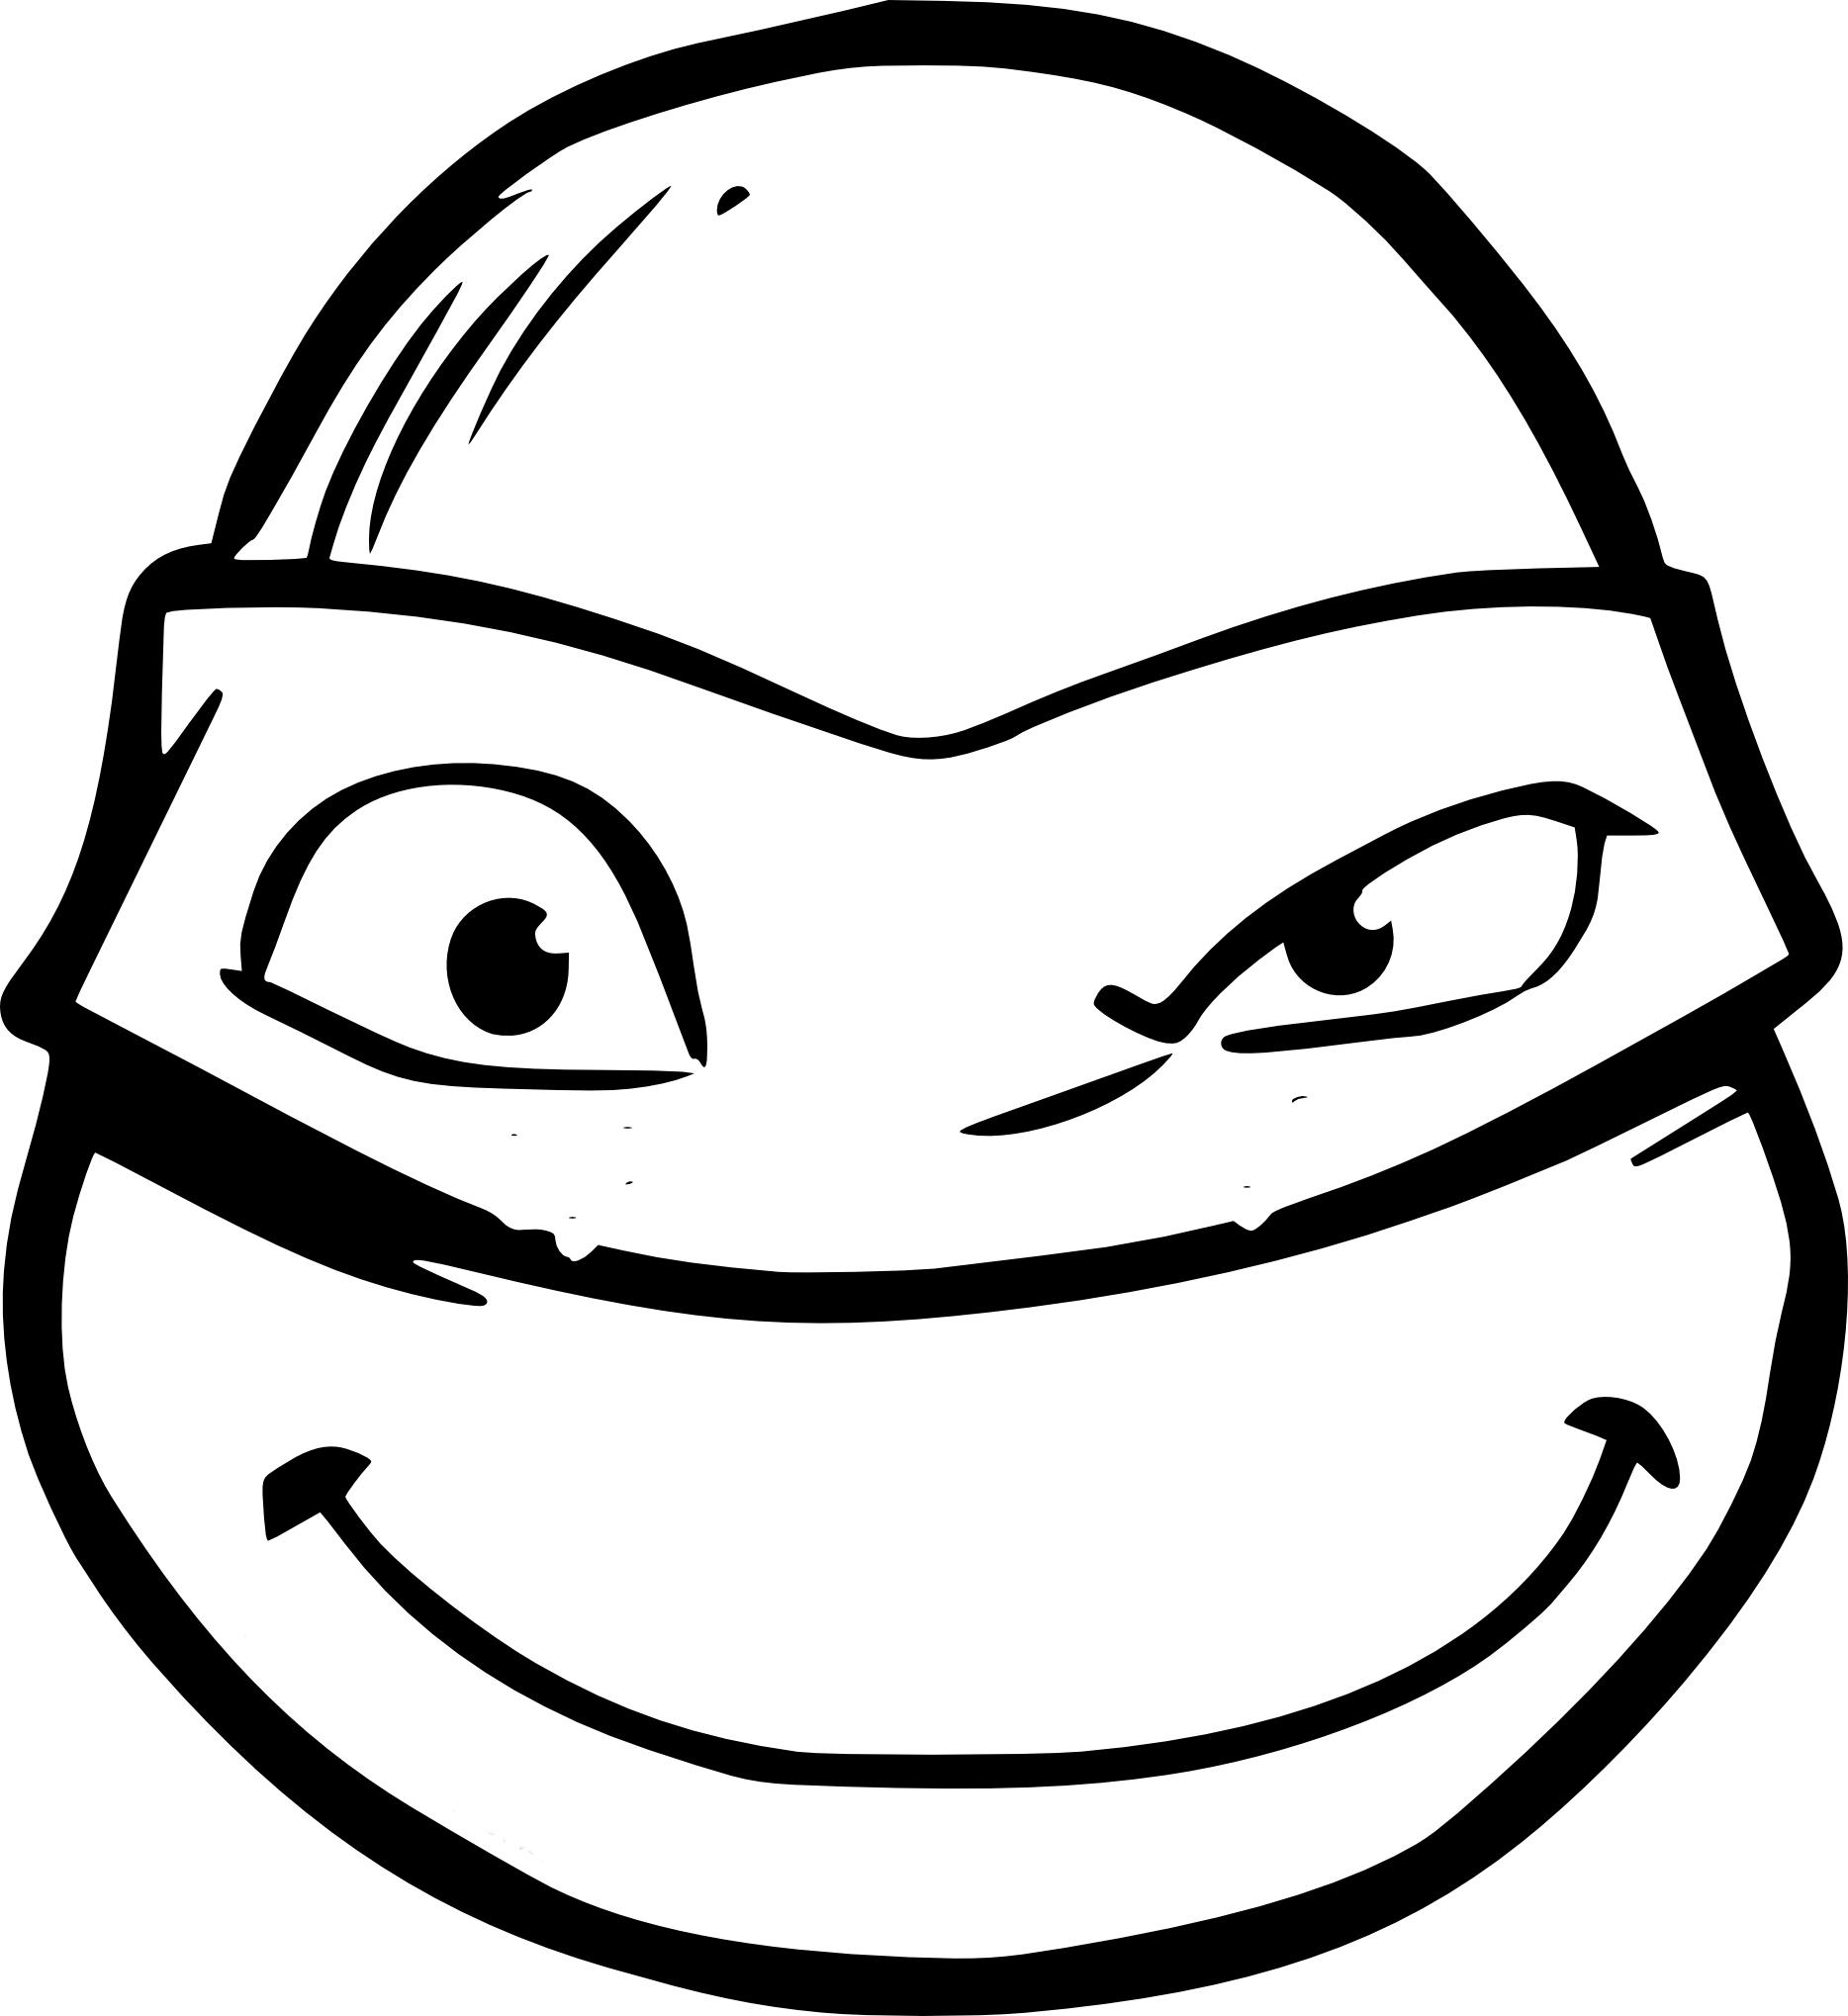 Coloriage Visage Tortue Ninja À Imprimer pour Dessin De Tortue Ninja